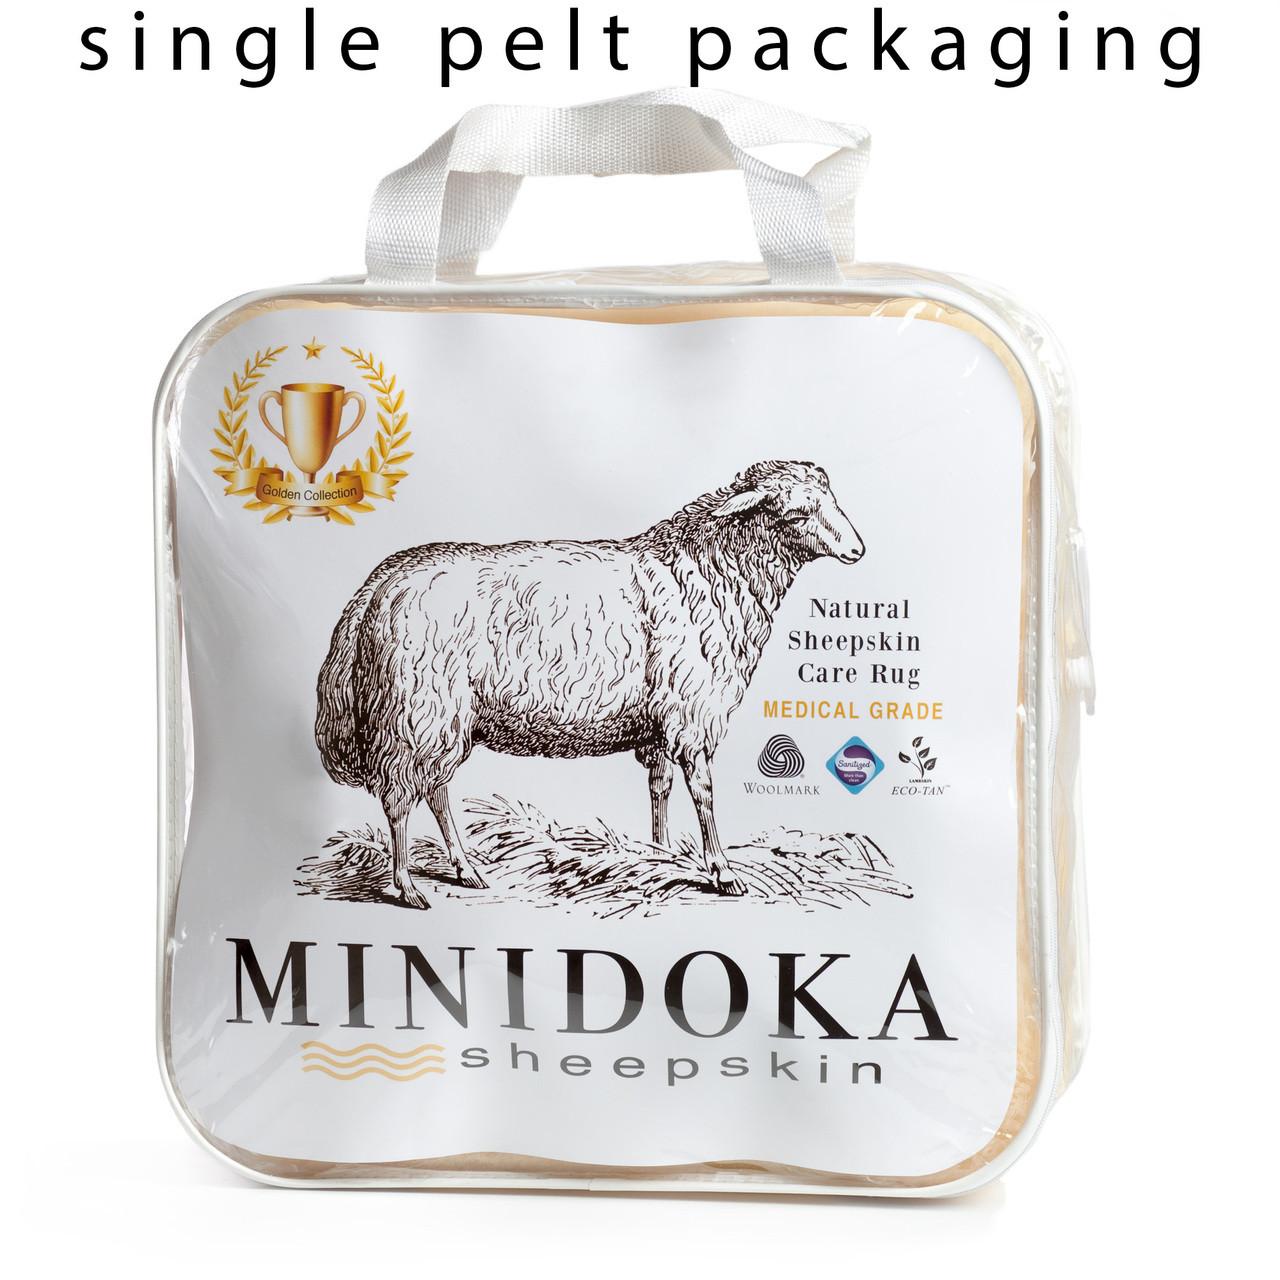 Medical sheepskin underlay bed pad by Minidoka Sheepskin.